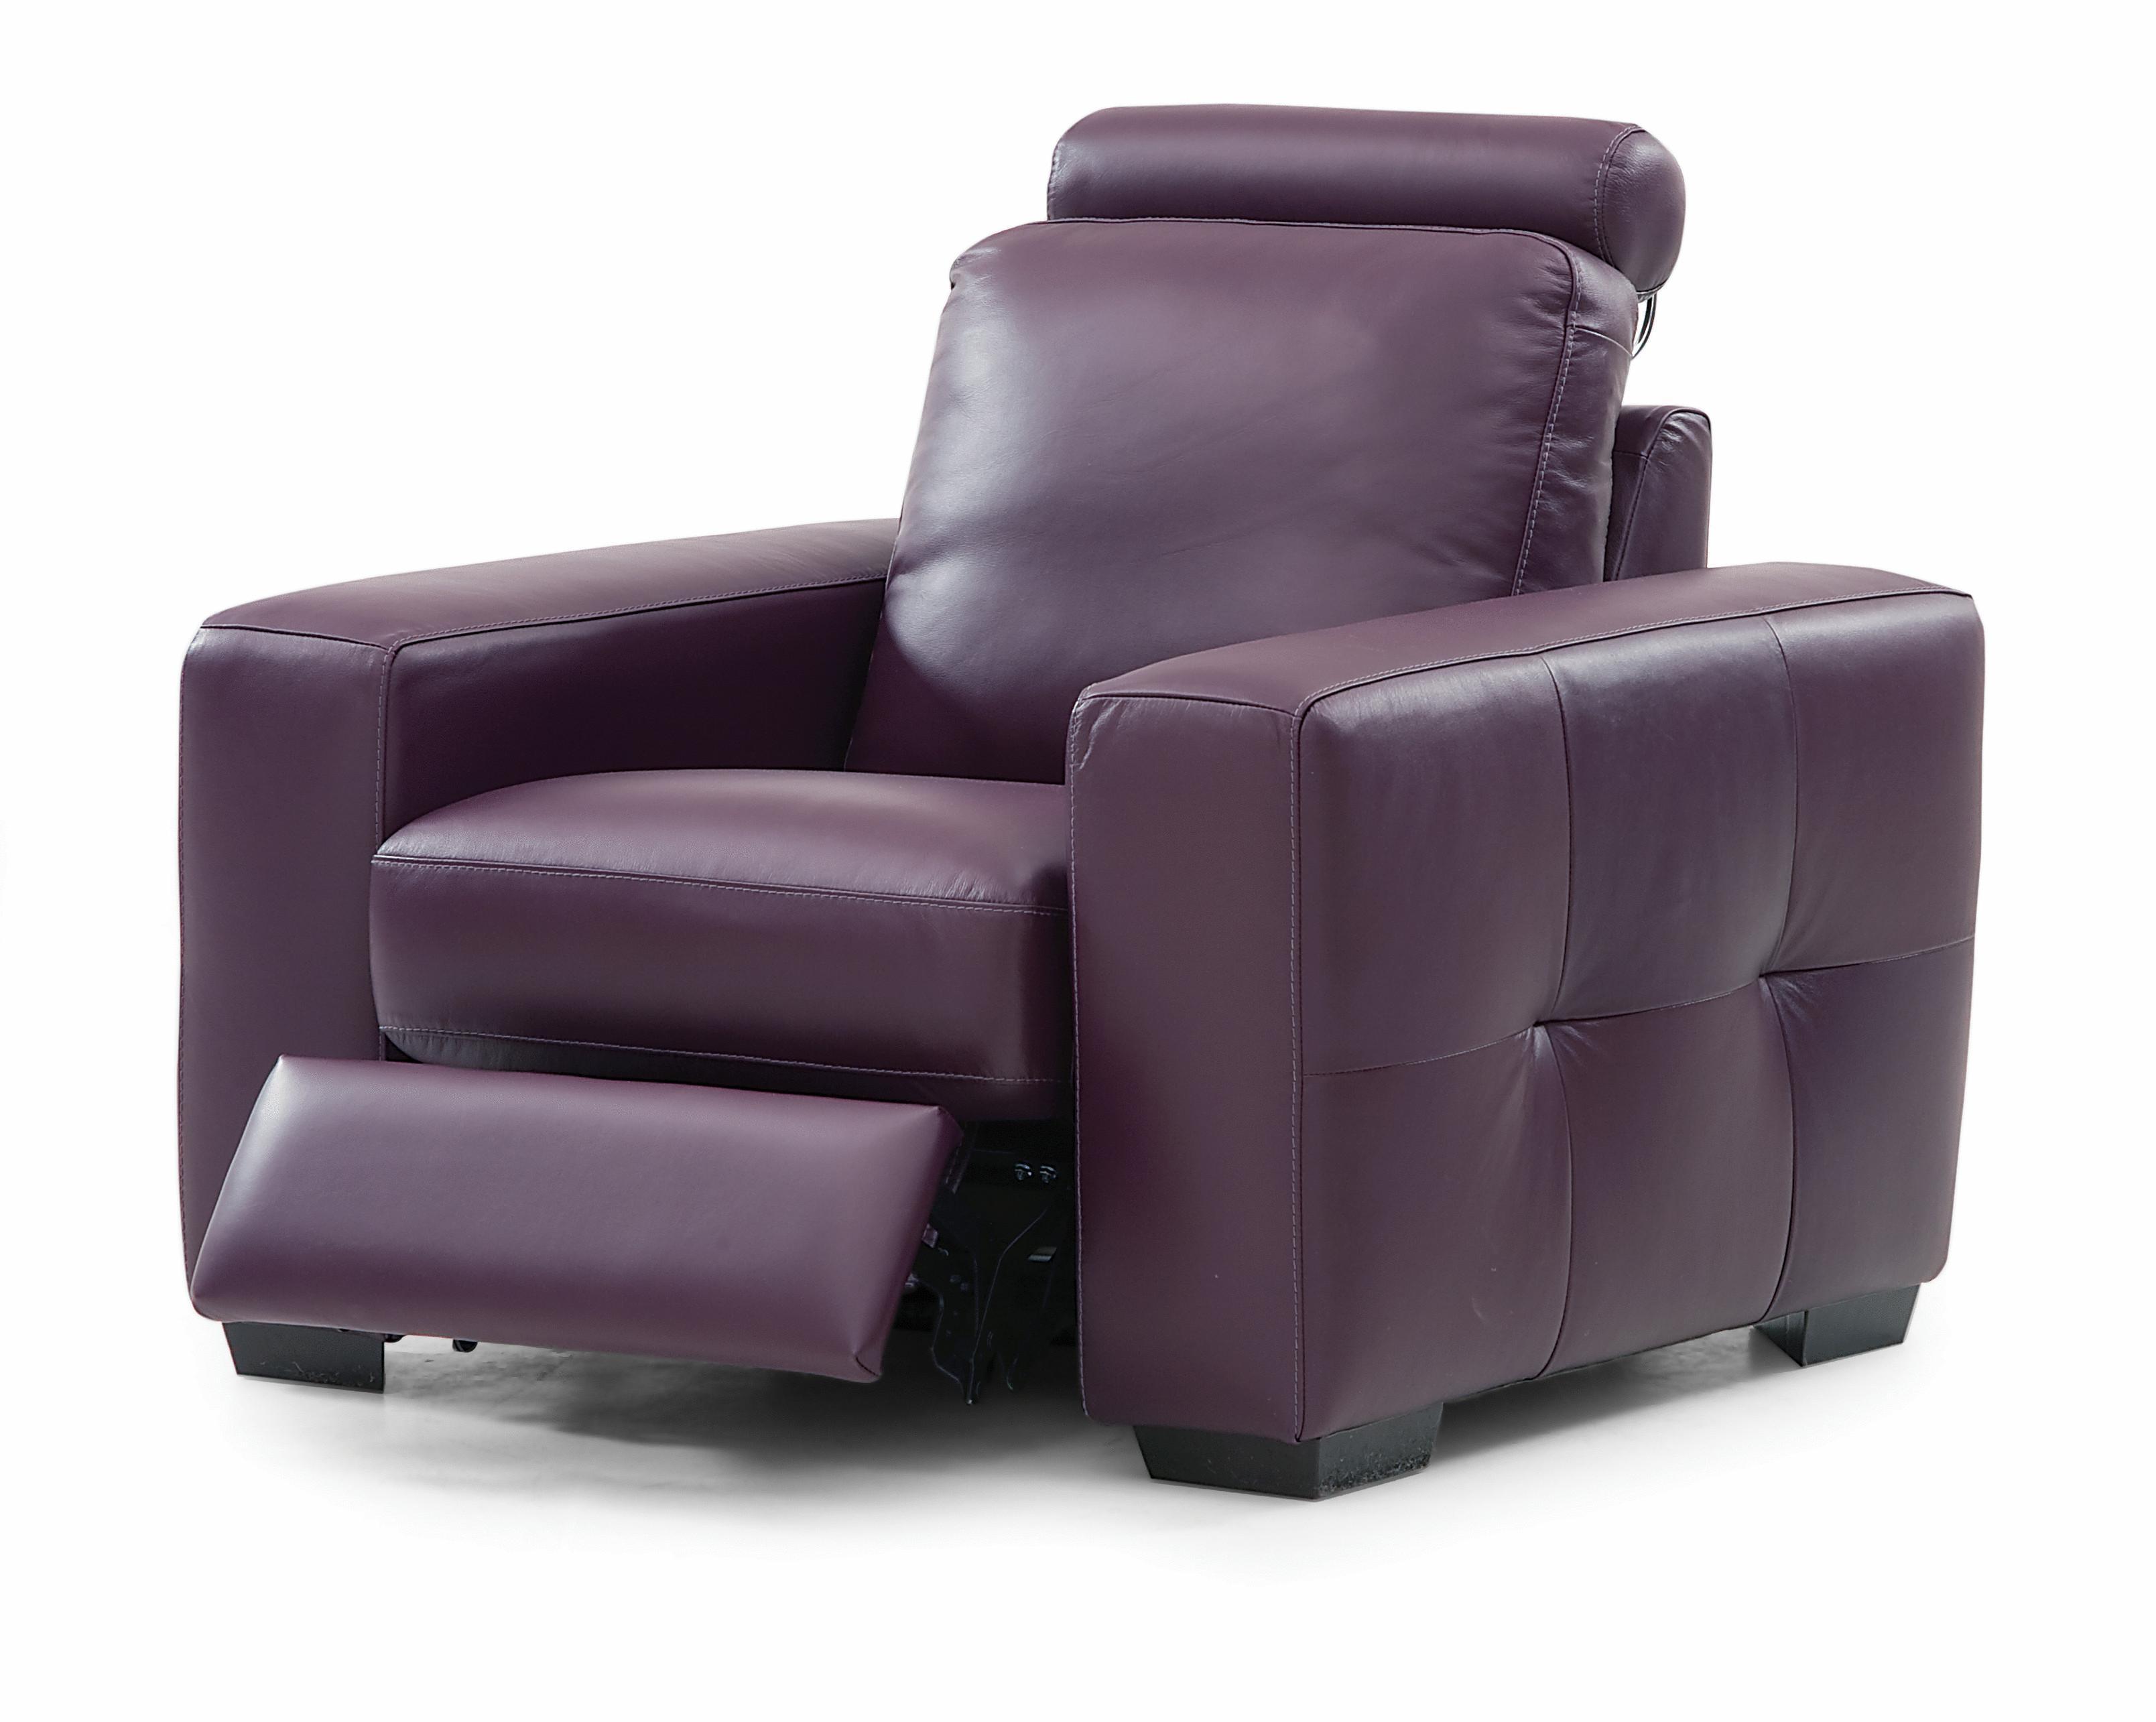 Palliser Push Contemporary Reclining Chair with Round Headrest